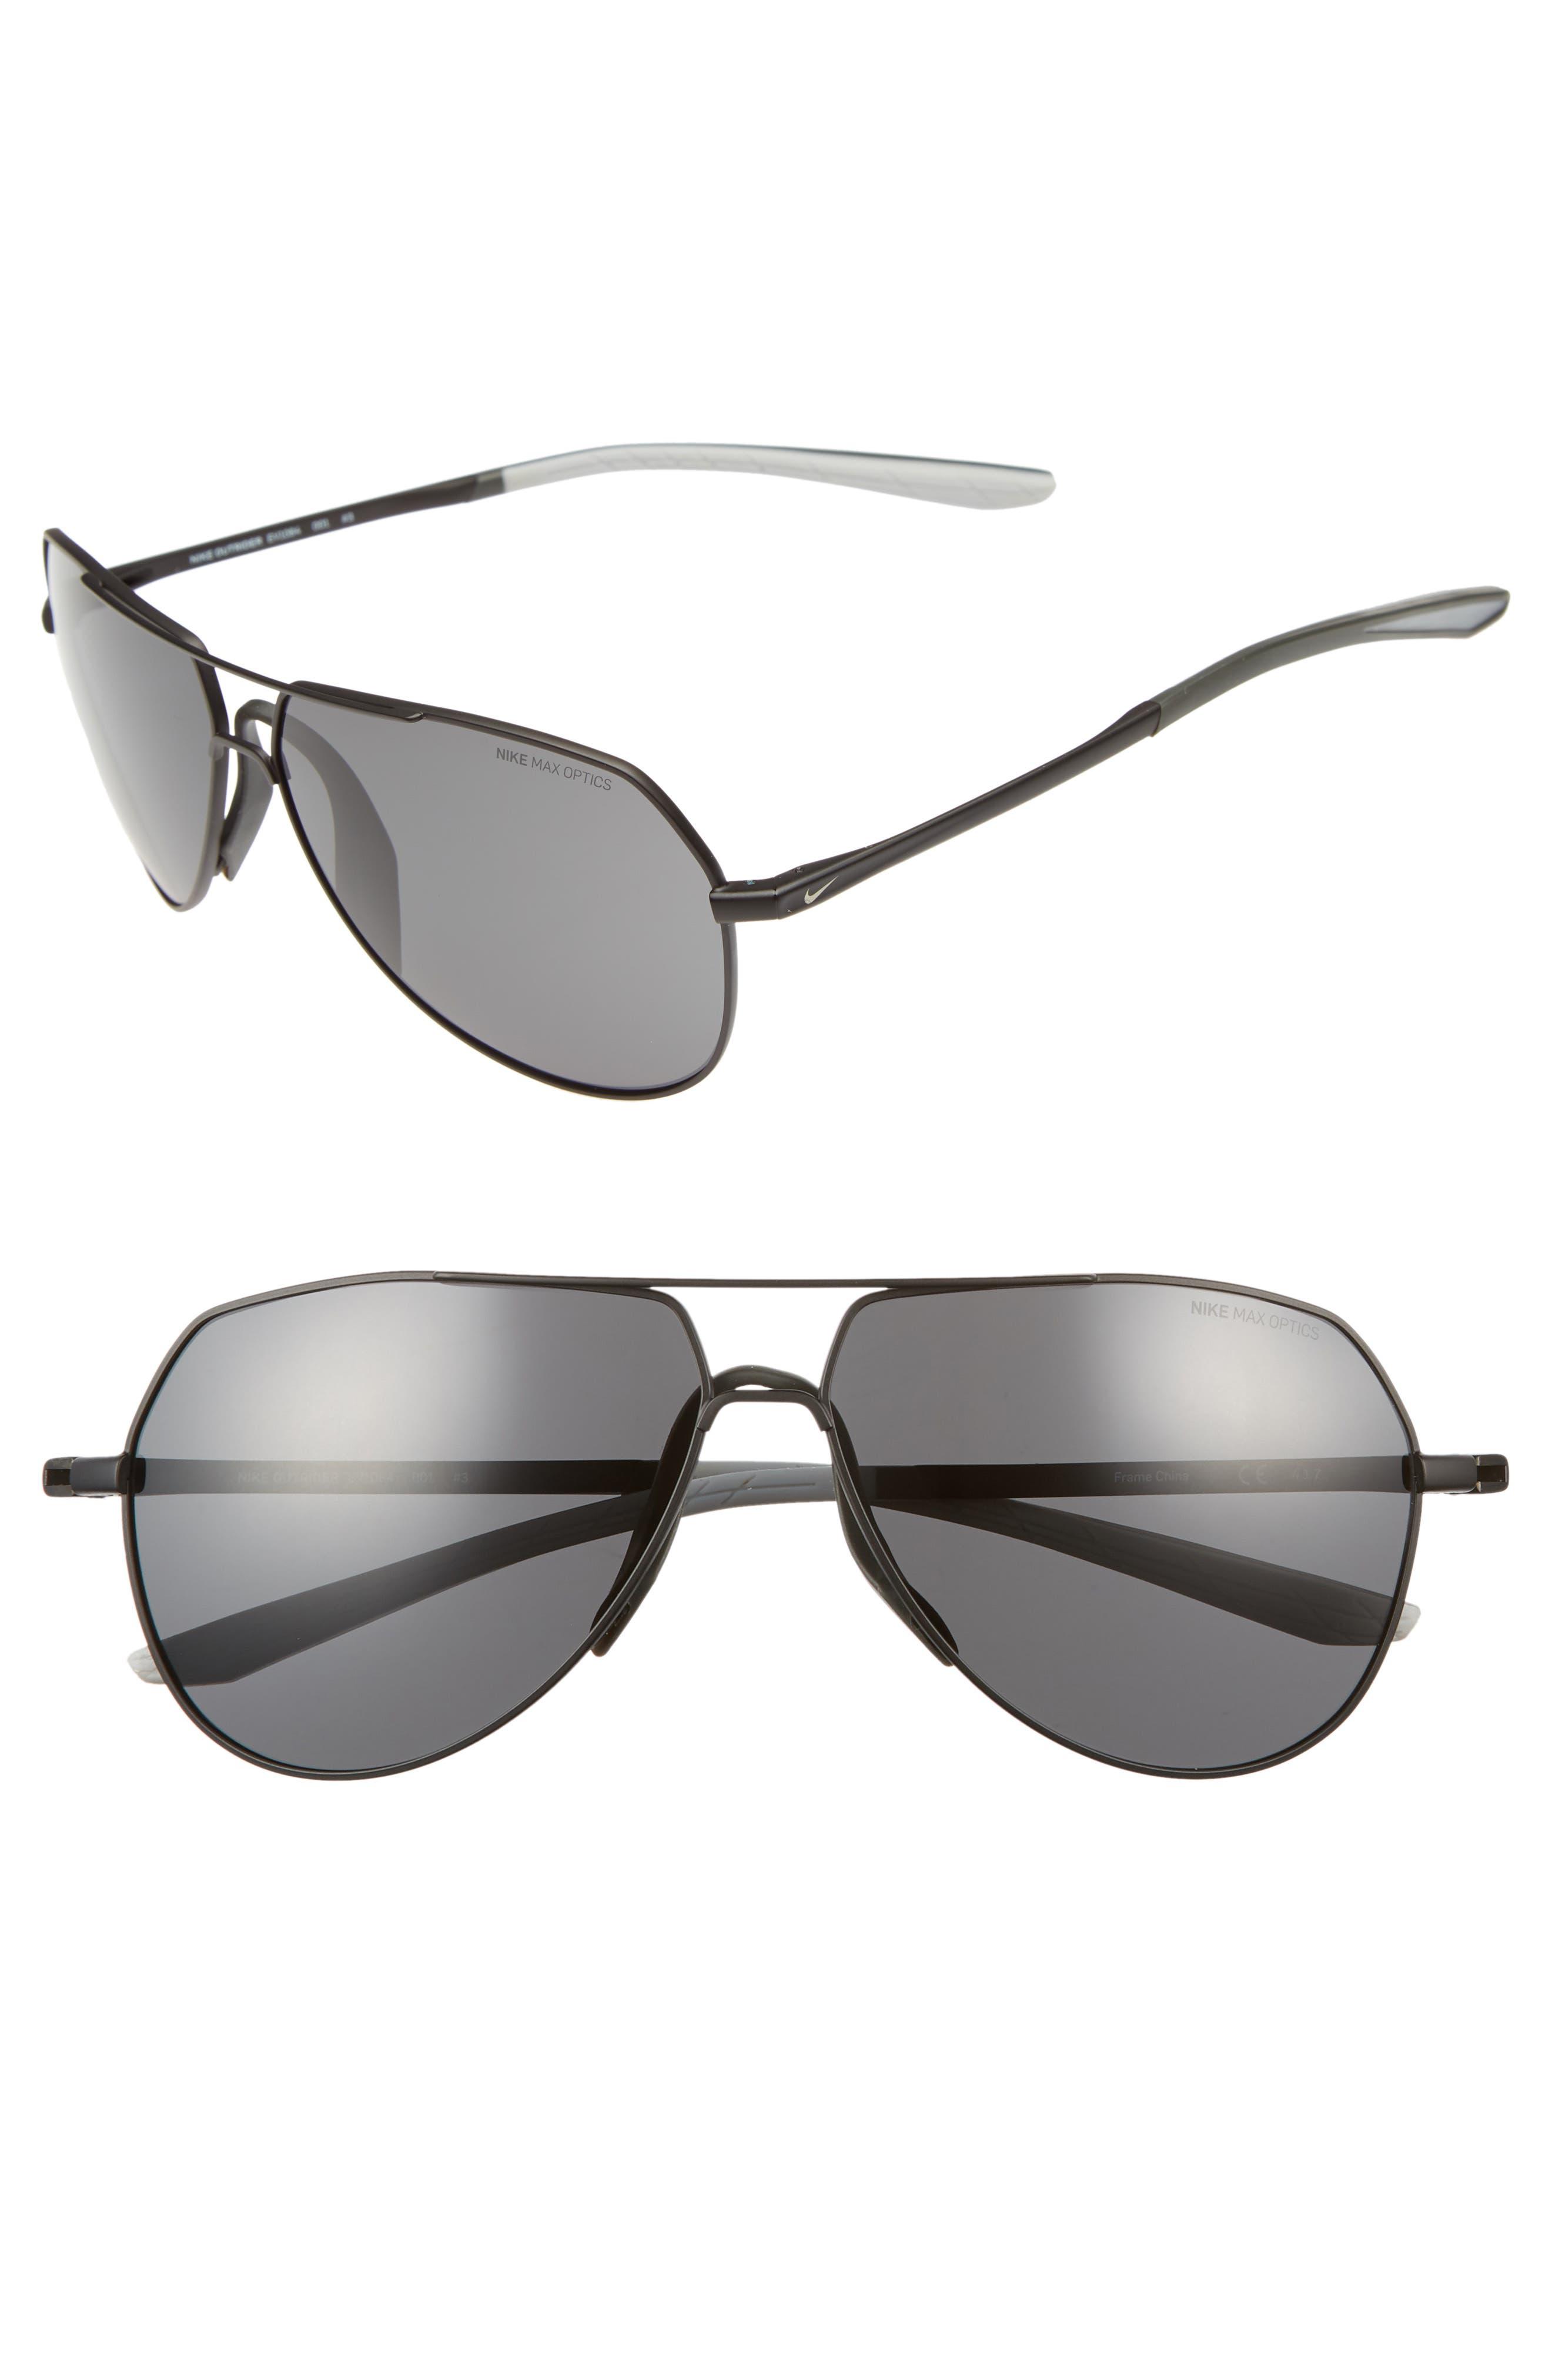 Outrider 62mm Oversize Aviator Sunglasses,                         Main,                         color, BLACK/ GREY